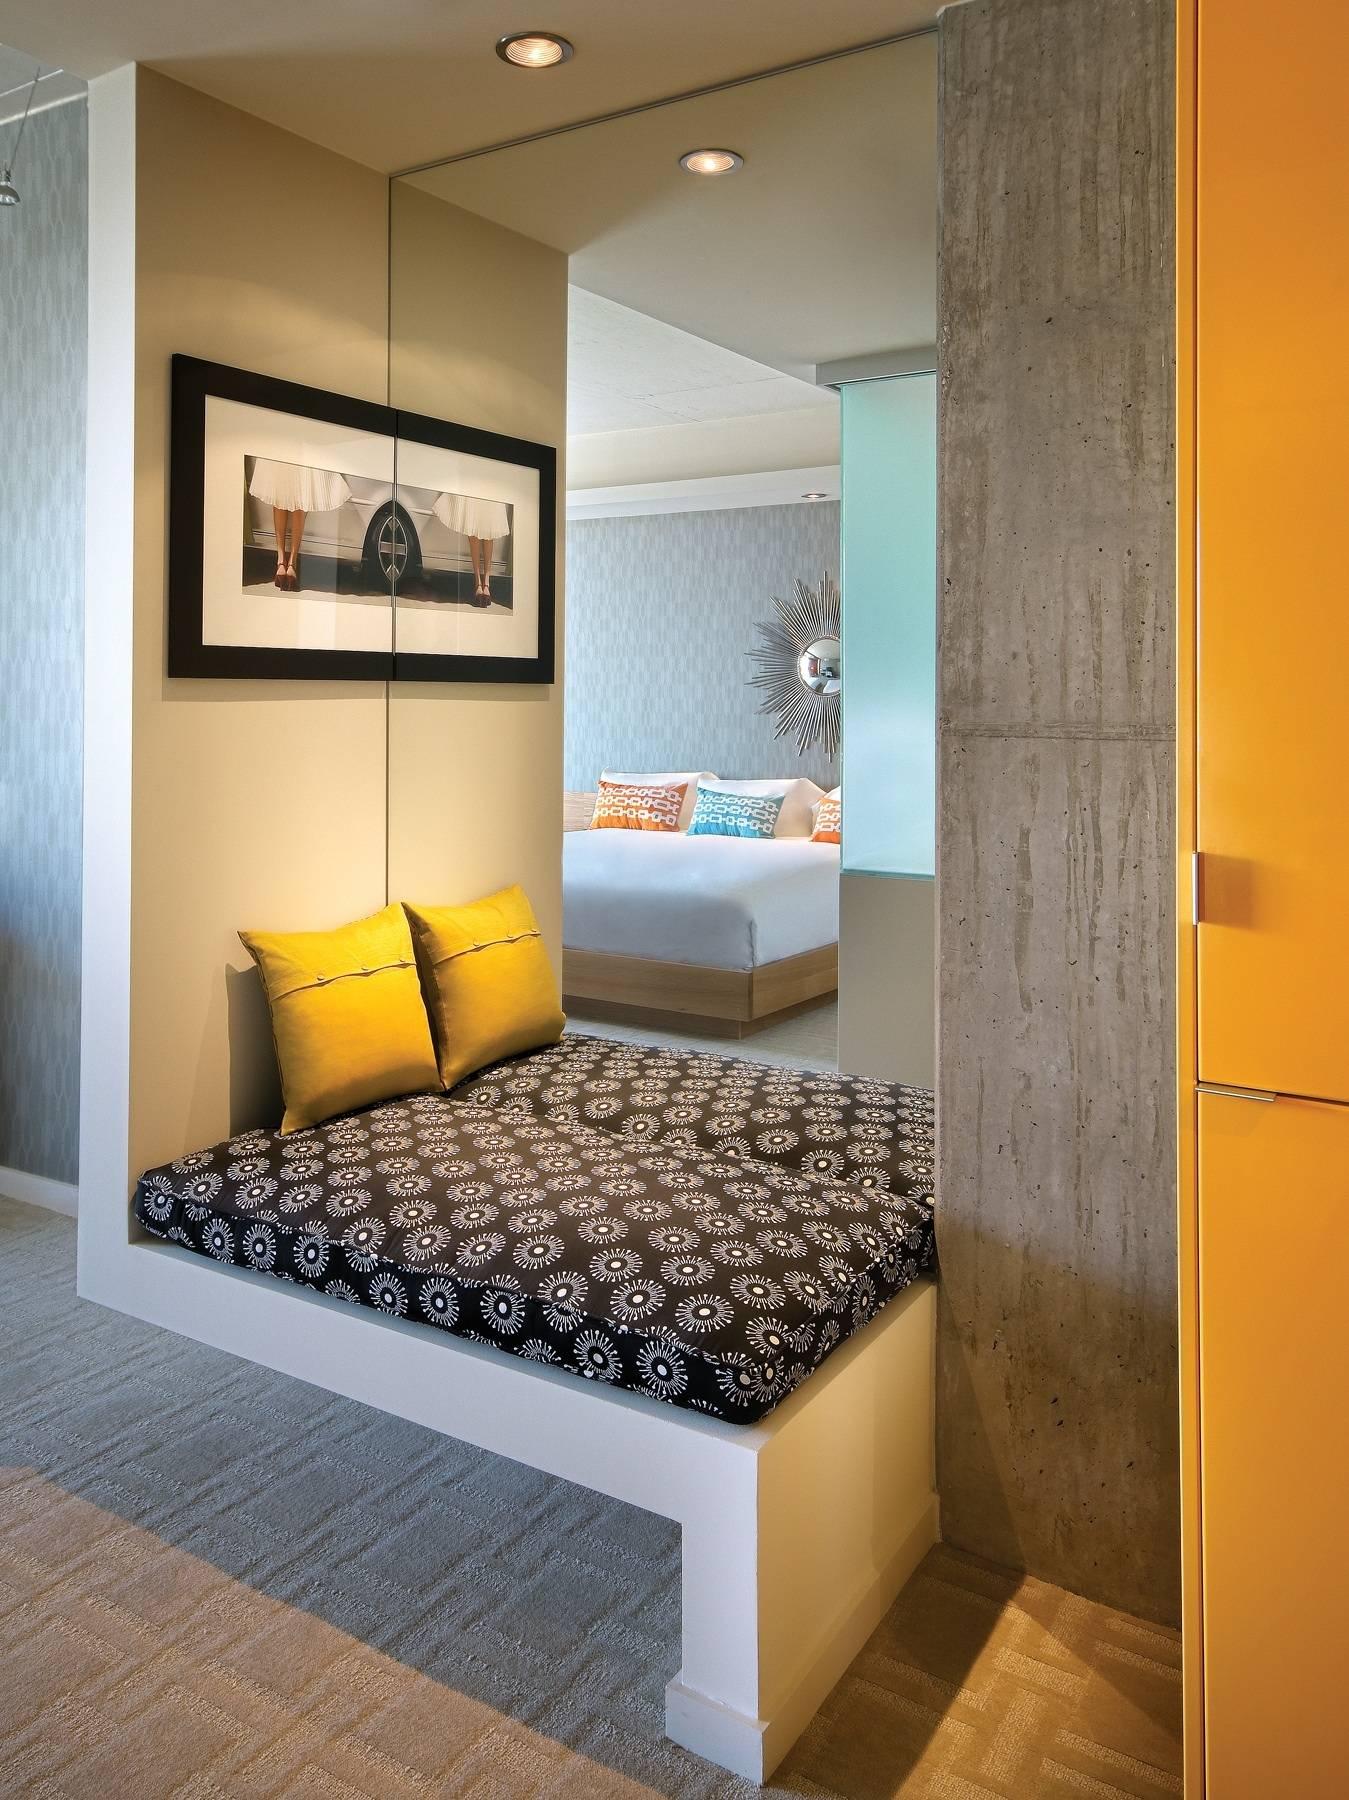 HotelValleyHo_Bedroom Bench